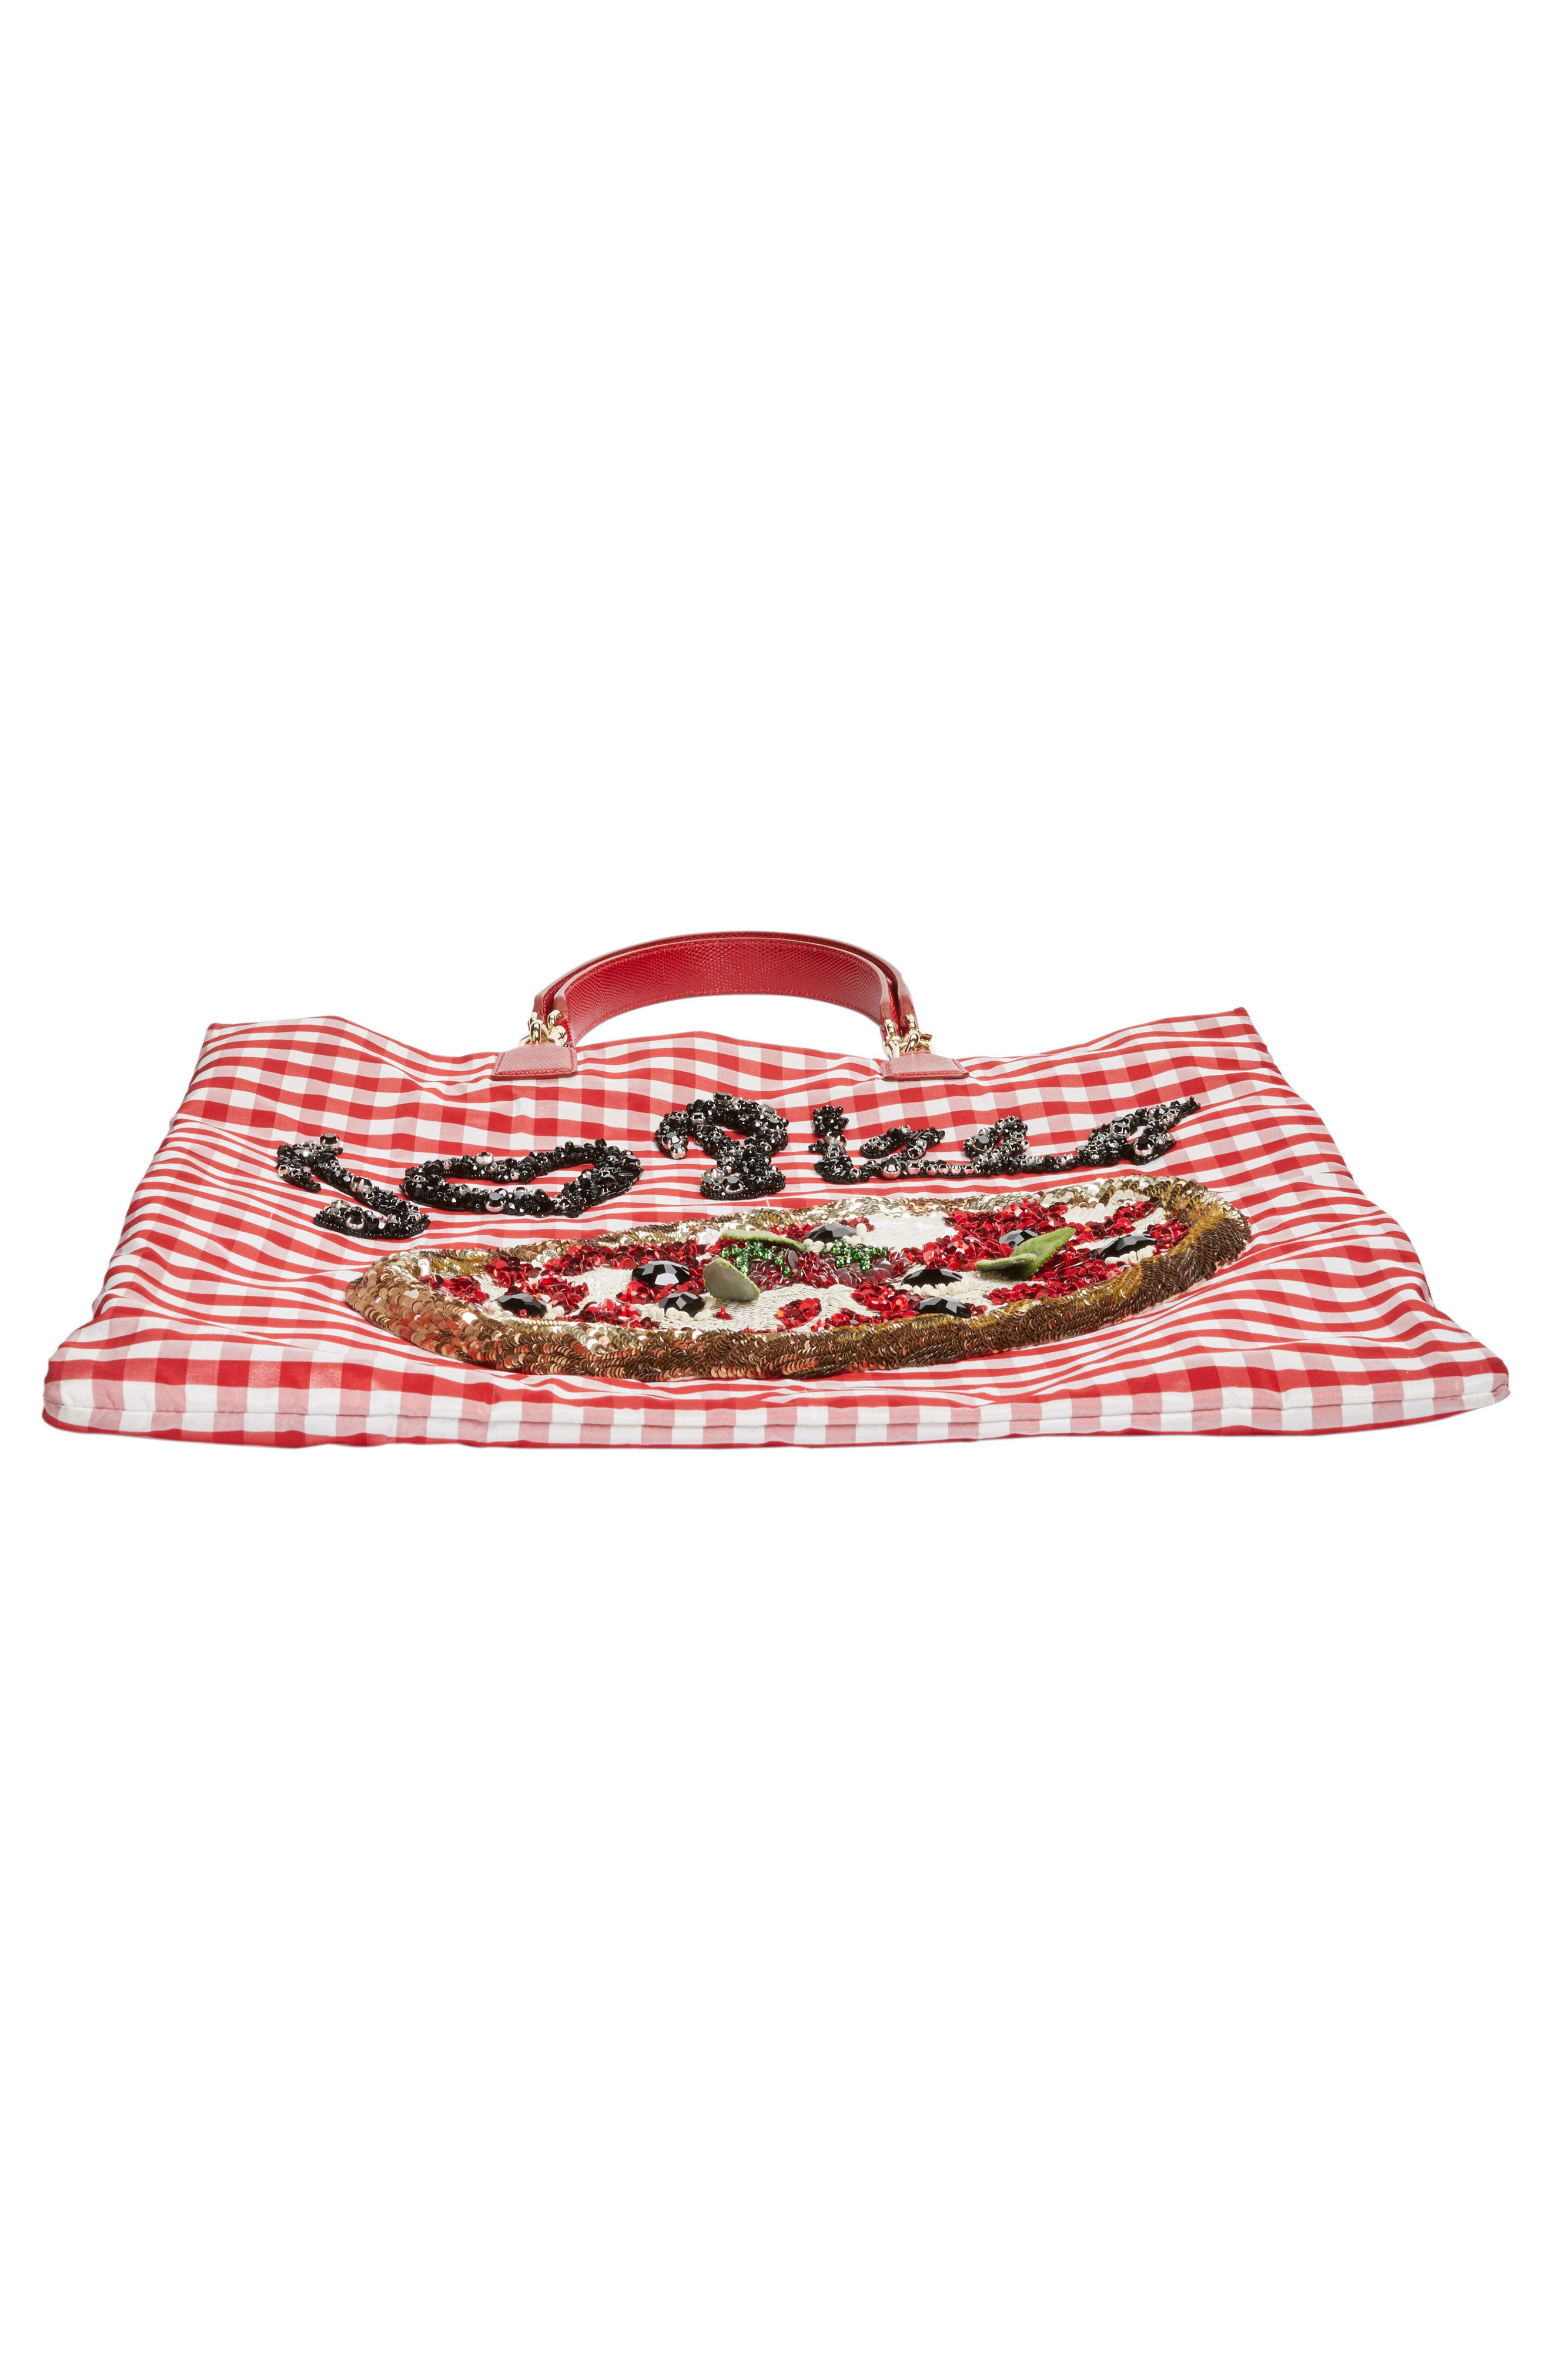 DOLCE&GABBANA, I Love Pizza Tote, Alternate thumbnail 6, color, 640